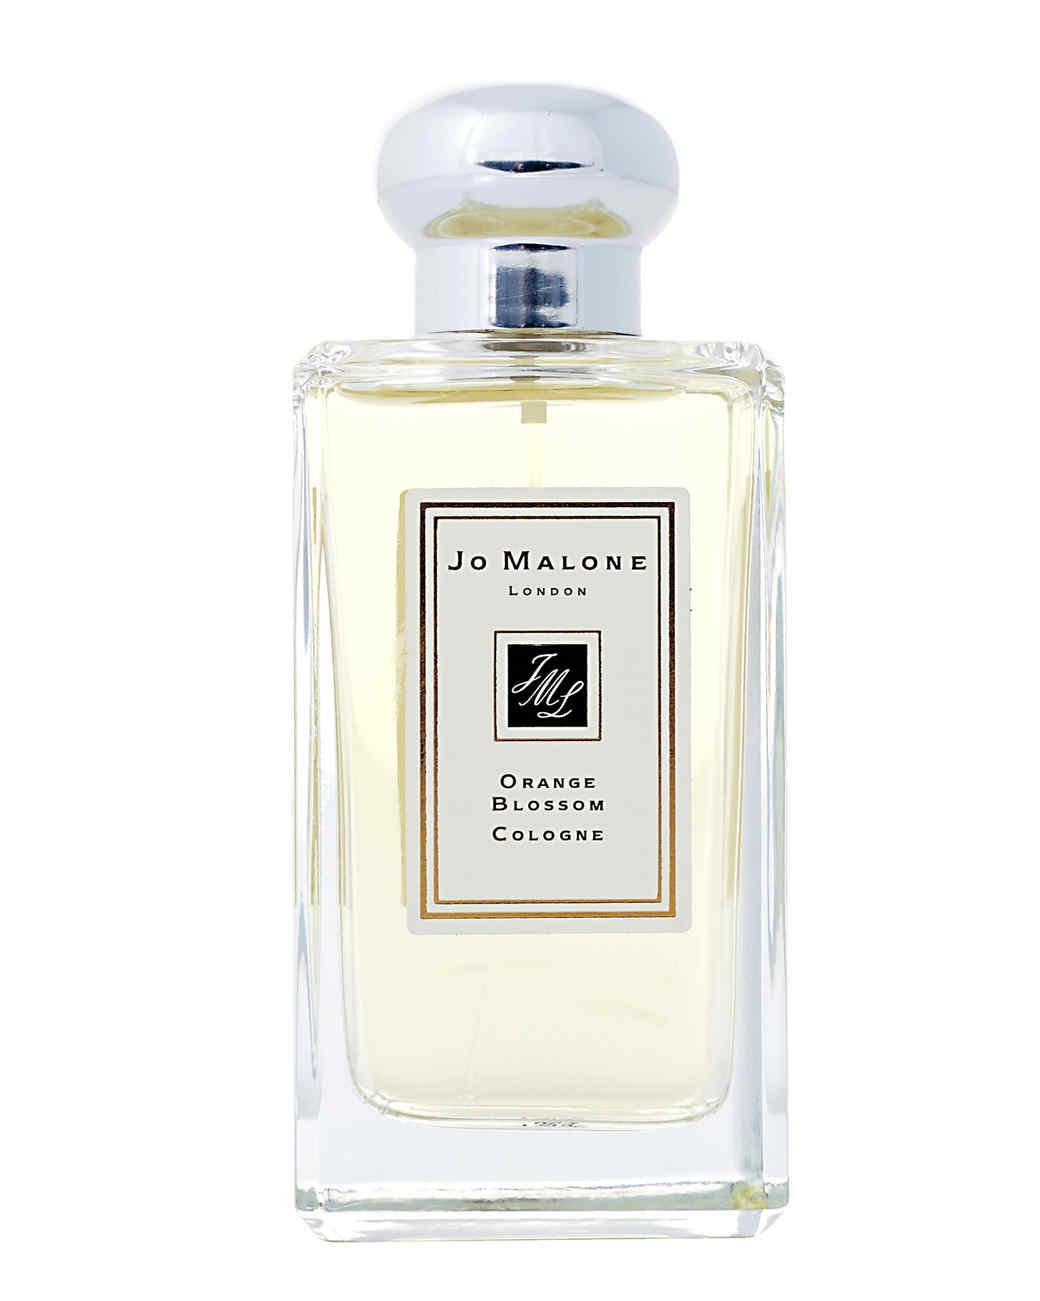 jo-malone-fragrance-mld110945.jpg